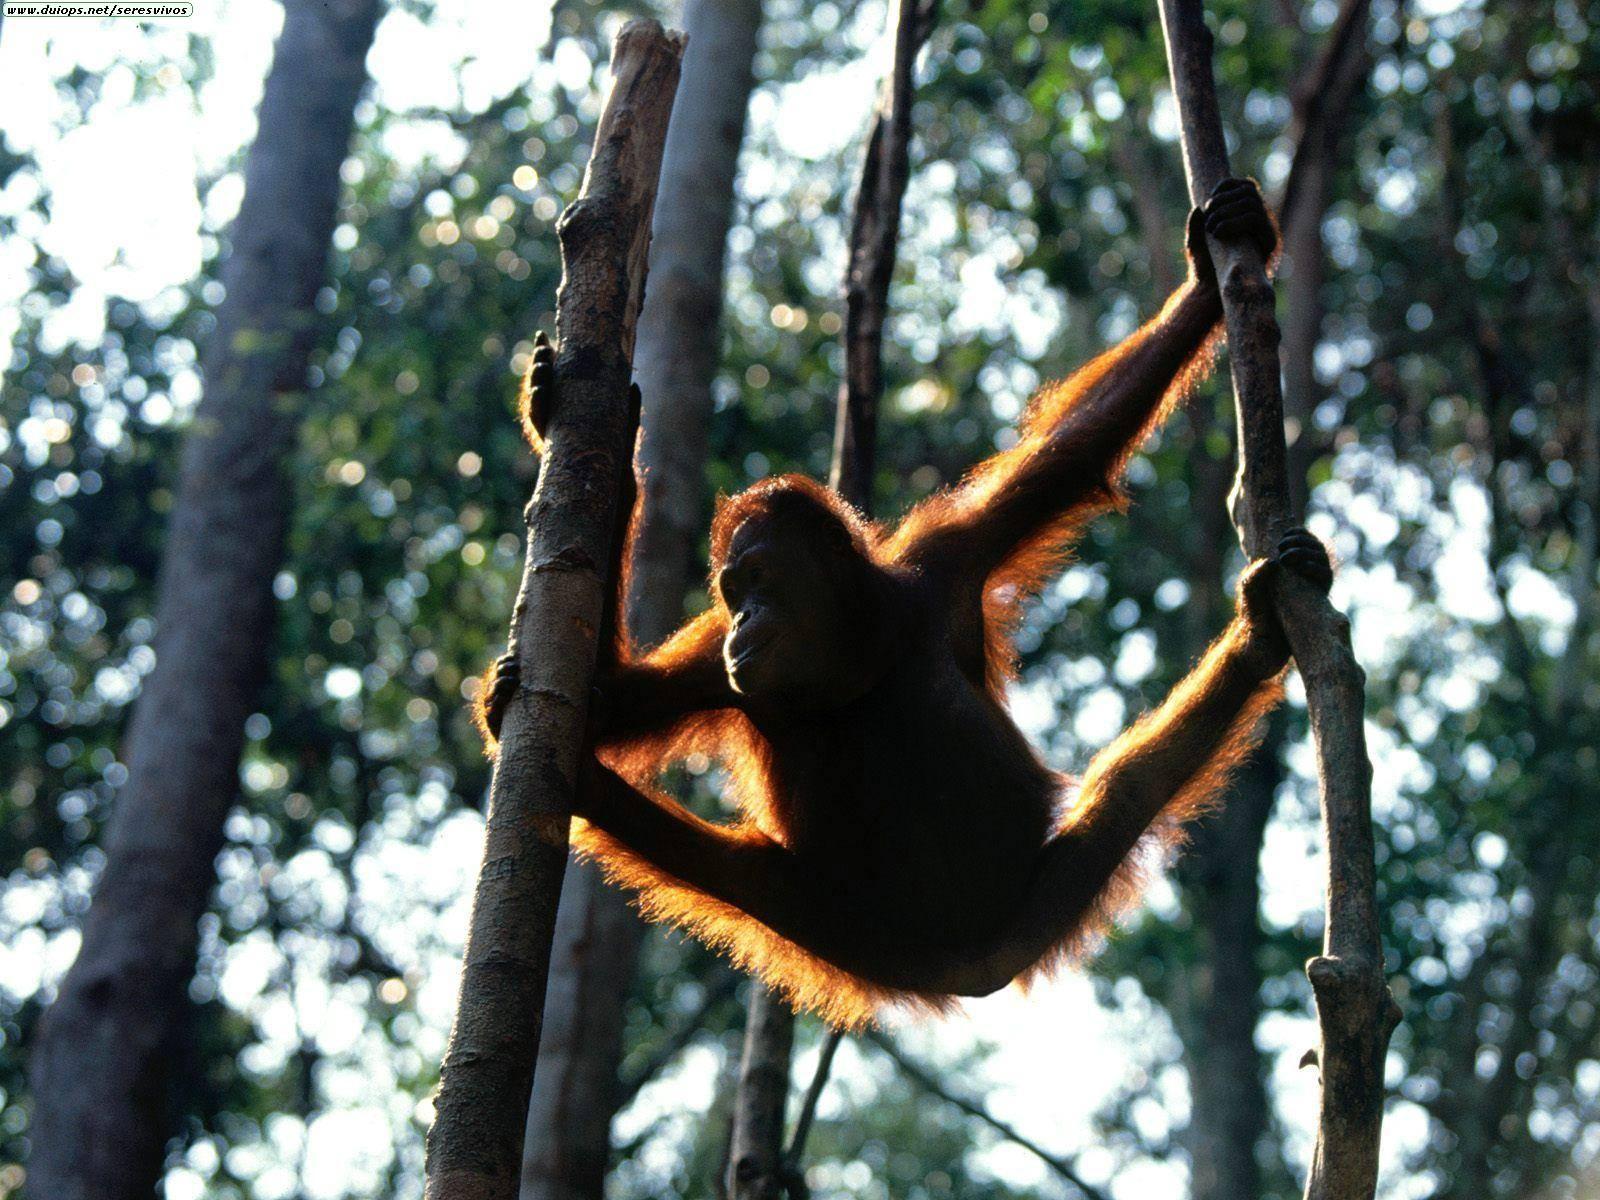 http://www.duiops.net/seresvivos/galeria/orangutanes/ph-14977.jpg